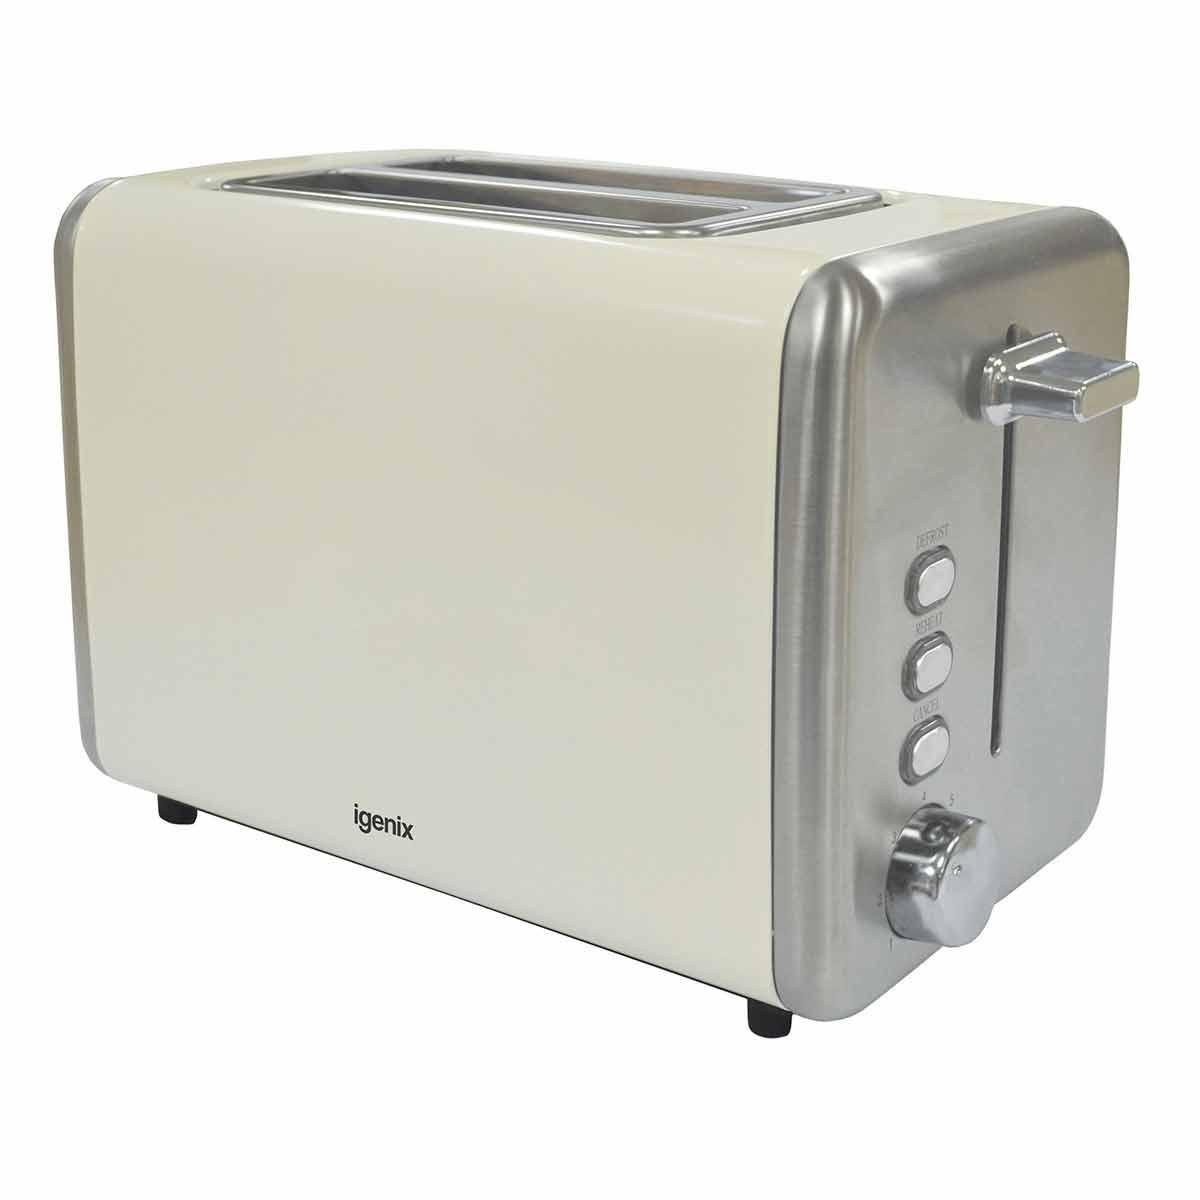 Igenix 2 Slice Toaster with Stainless Steel, Cream